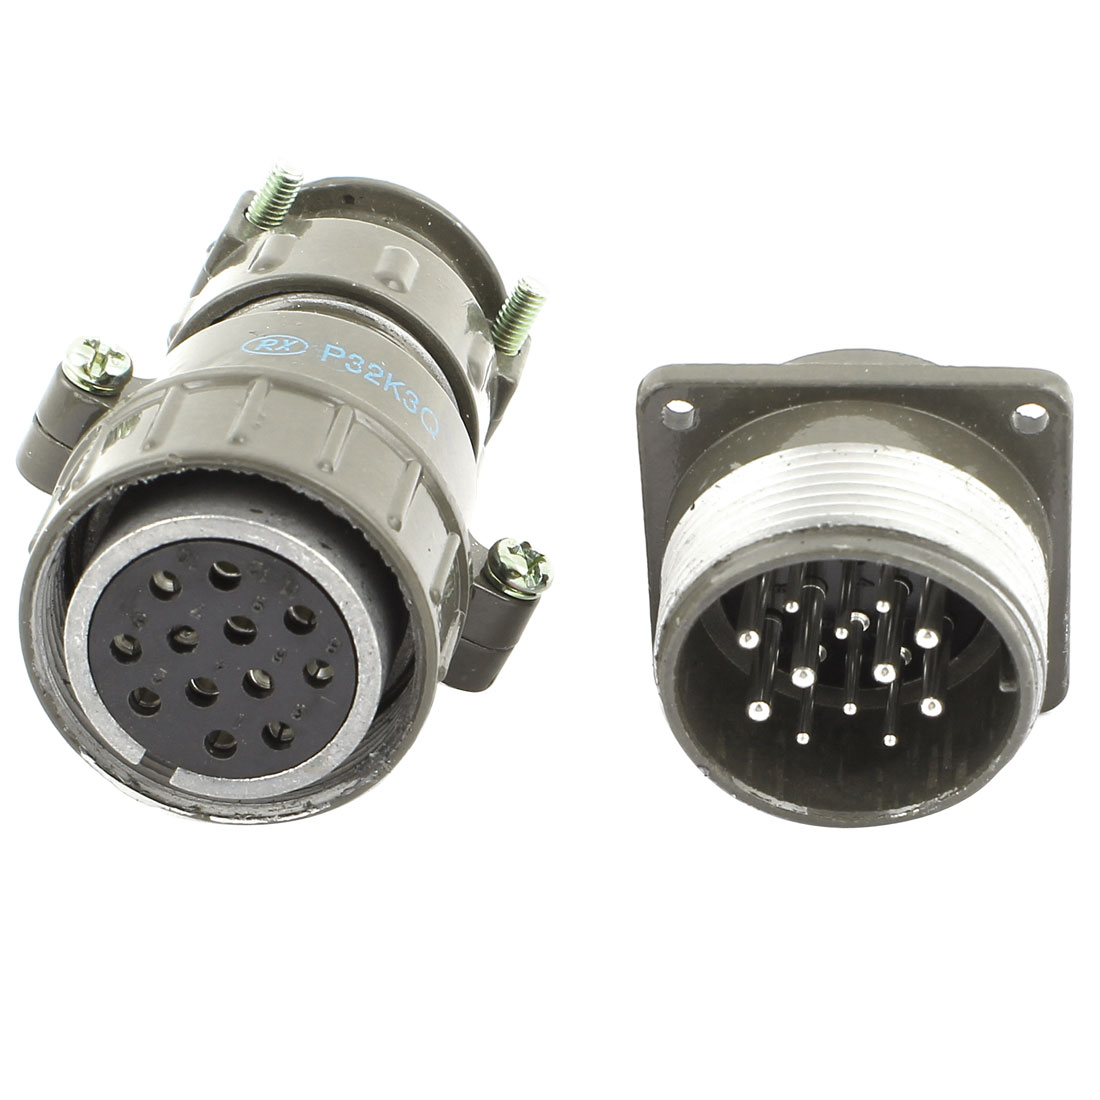 P32K3Q Metal Housing 12Pin Aviation Plug Male Female Connector AC 660V 20A